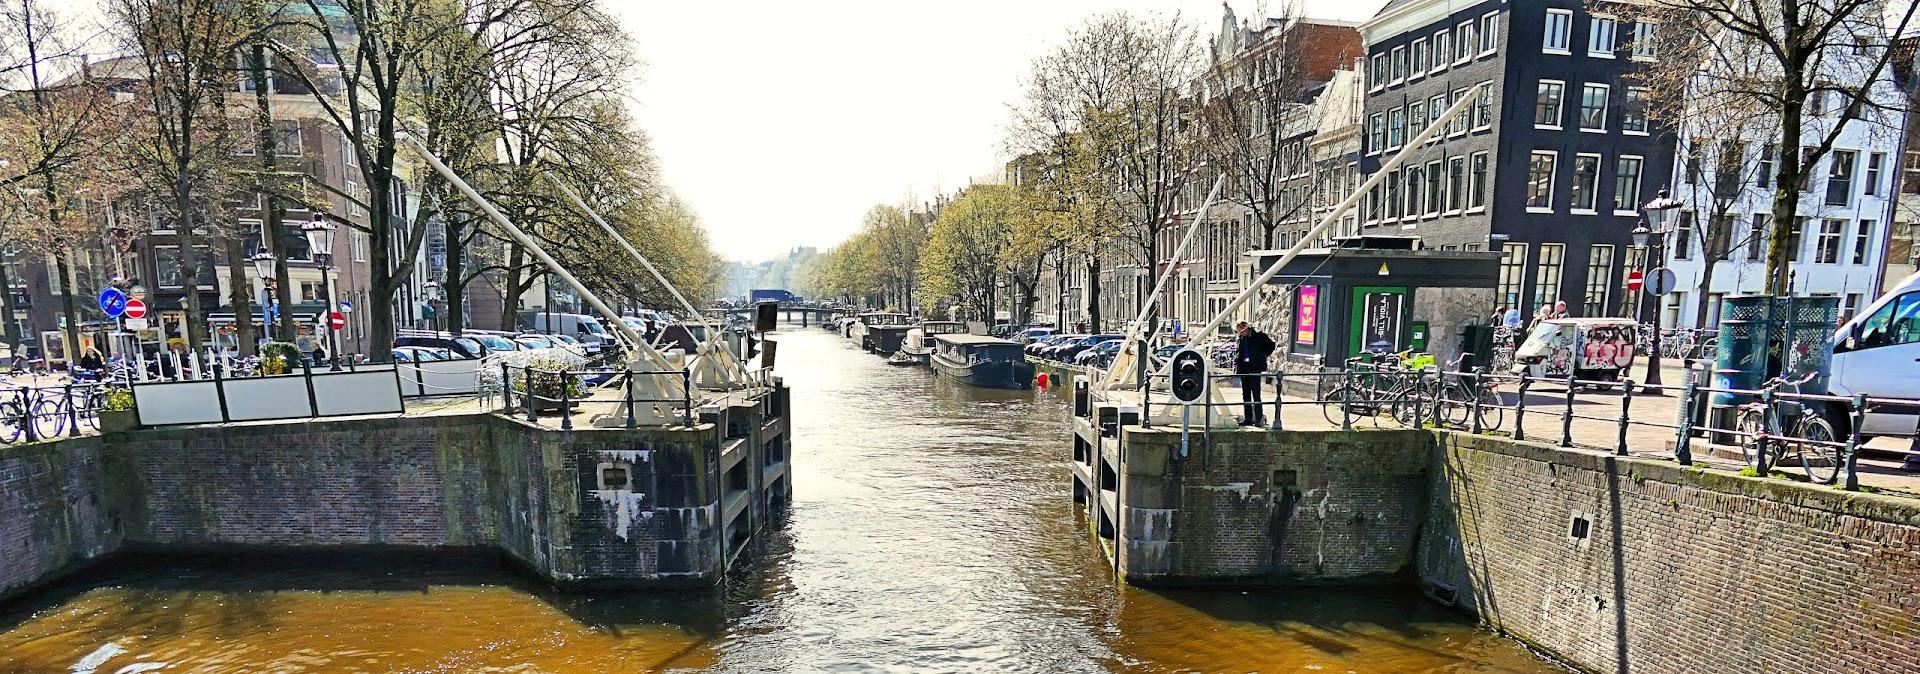 Aangeboden door: Stichting Microtoerisme InZicht Fotoblog Amsterdam nieuwe haarlemmer sluis